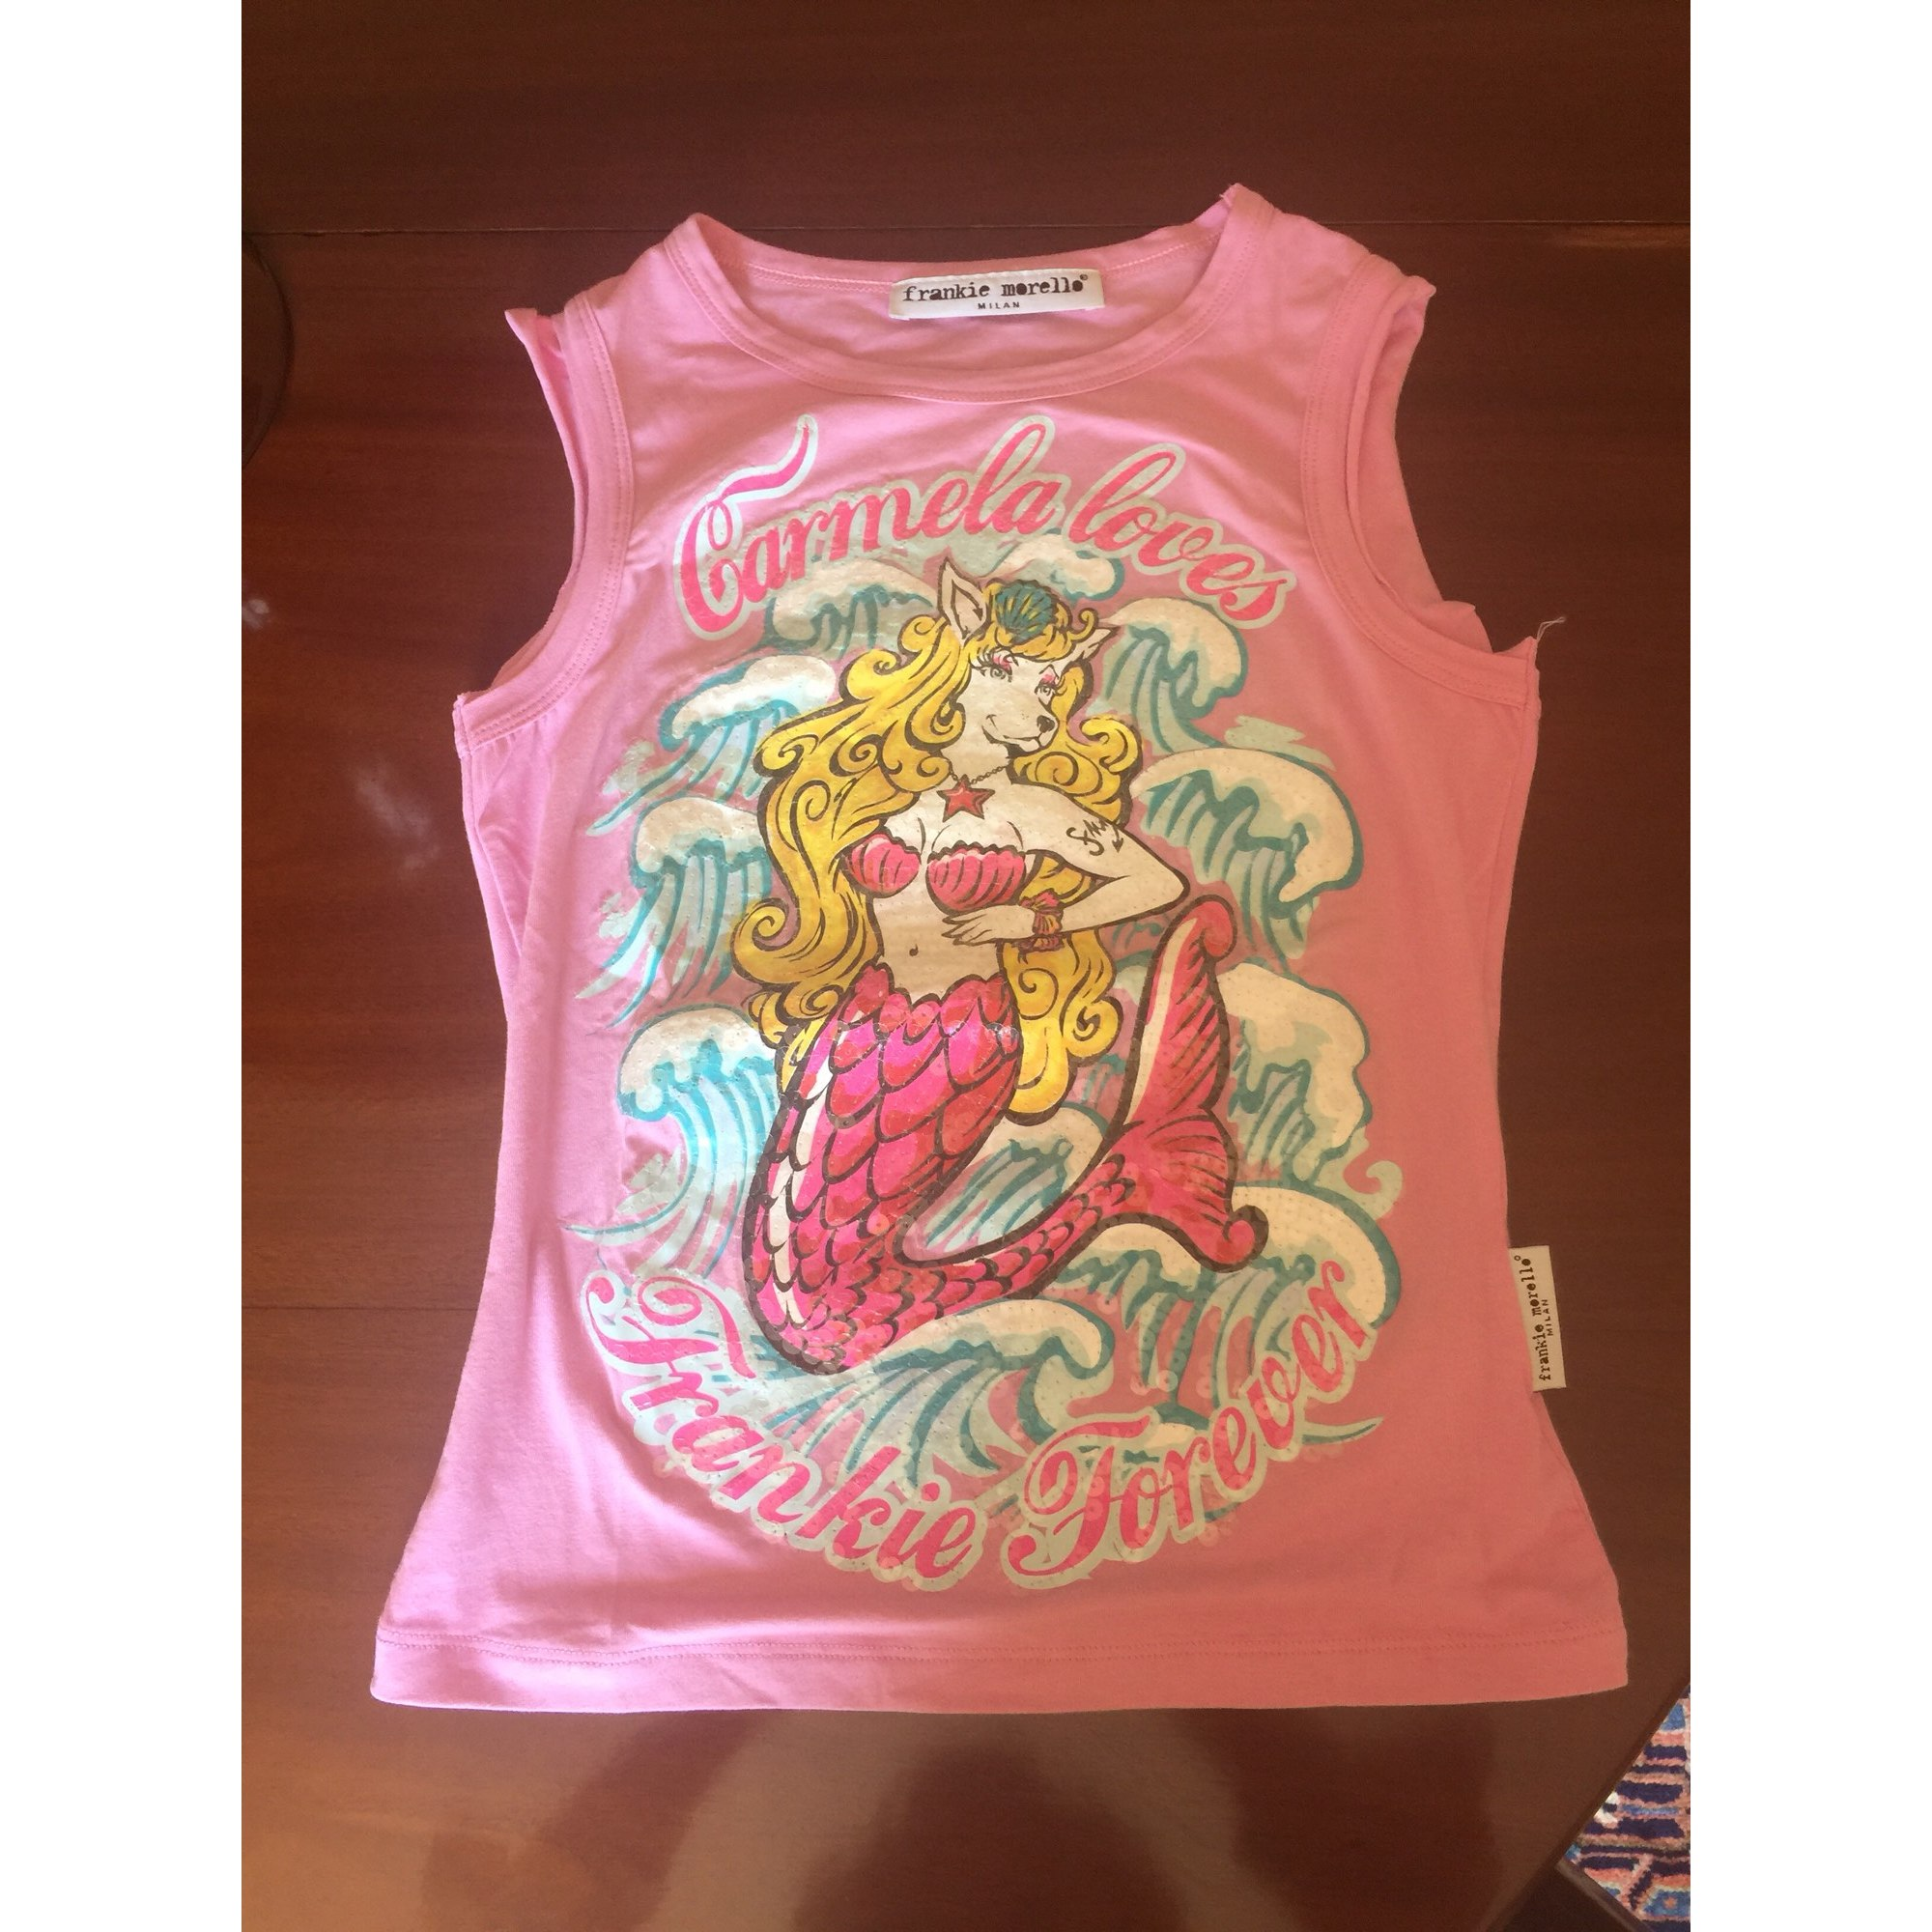 Top, tee-shirt FRANKIE MORELLO Rose, fuschia, vieux rose